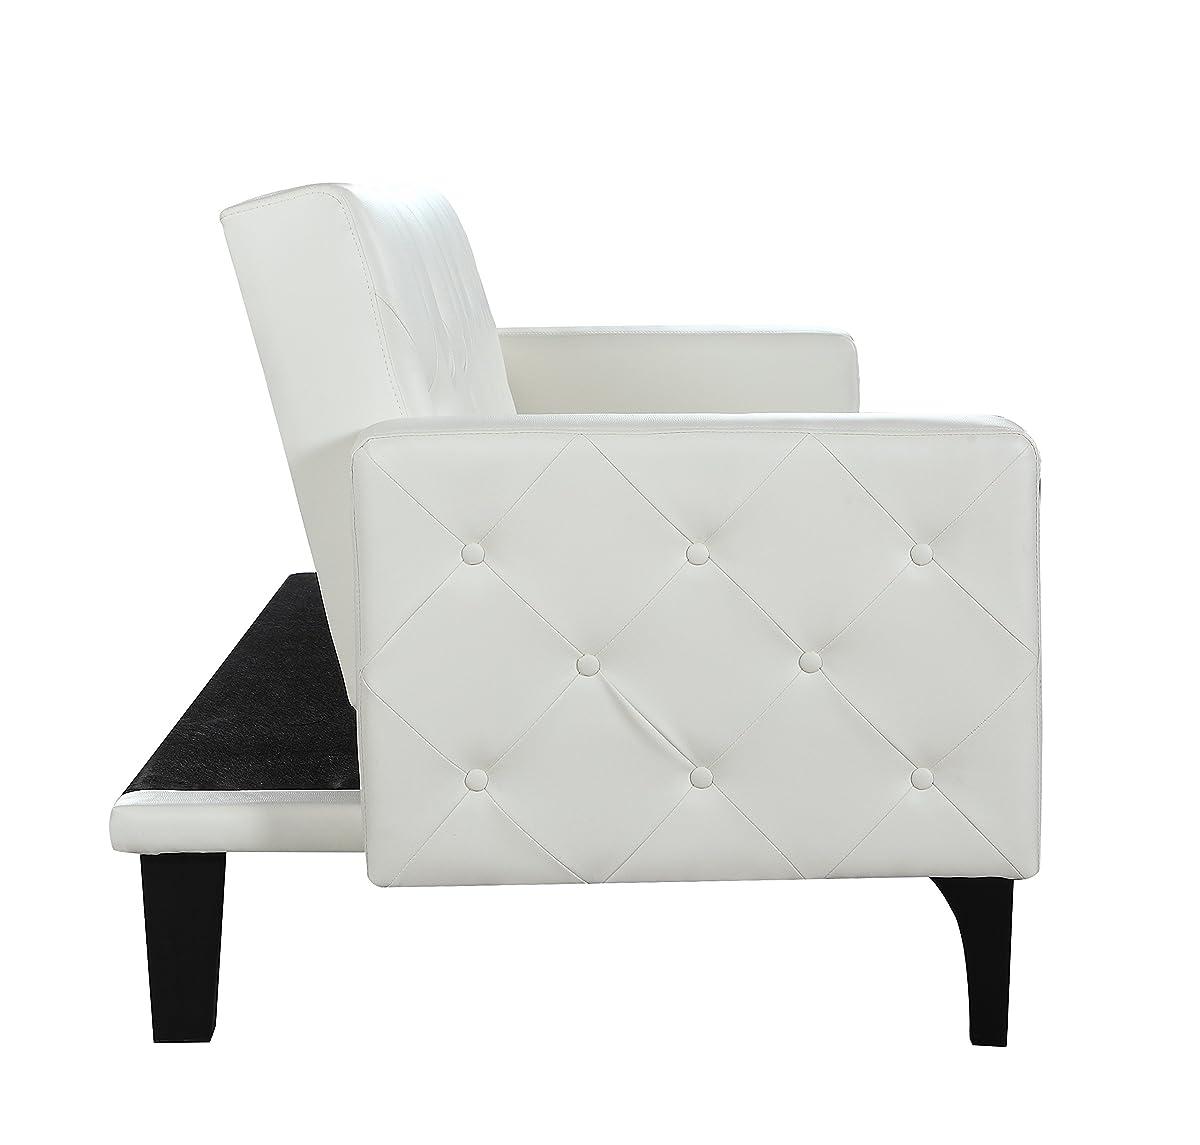 Modern Nailhead Sofa: Modern Tufted Bonded Leather Sleeper Futon Sofa With